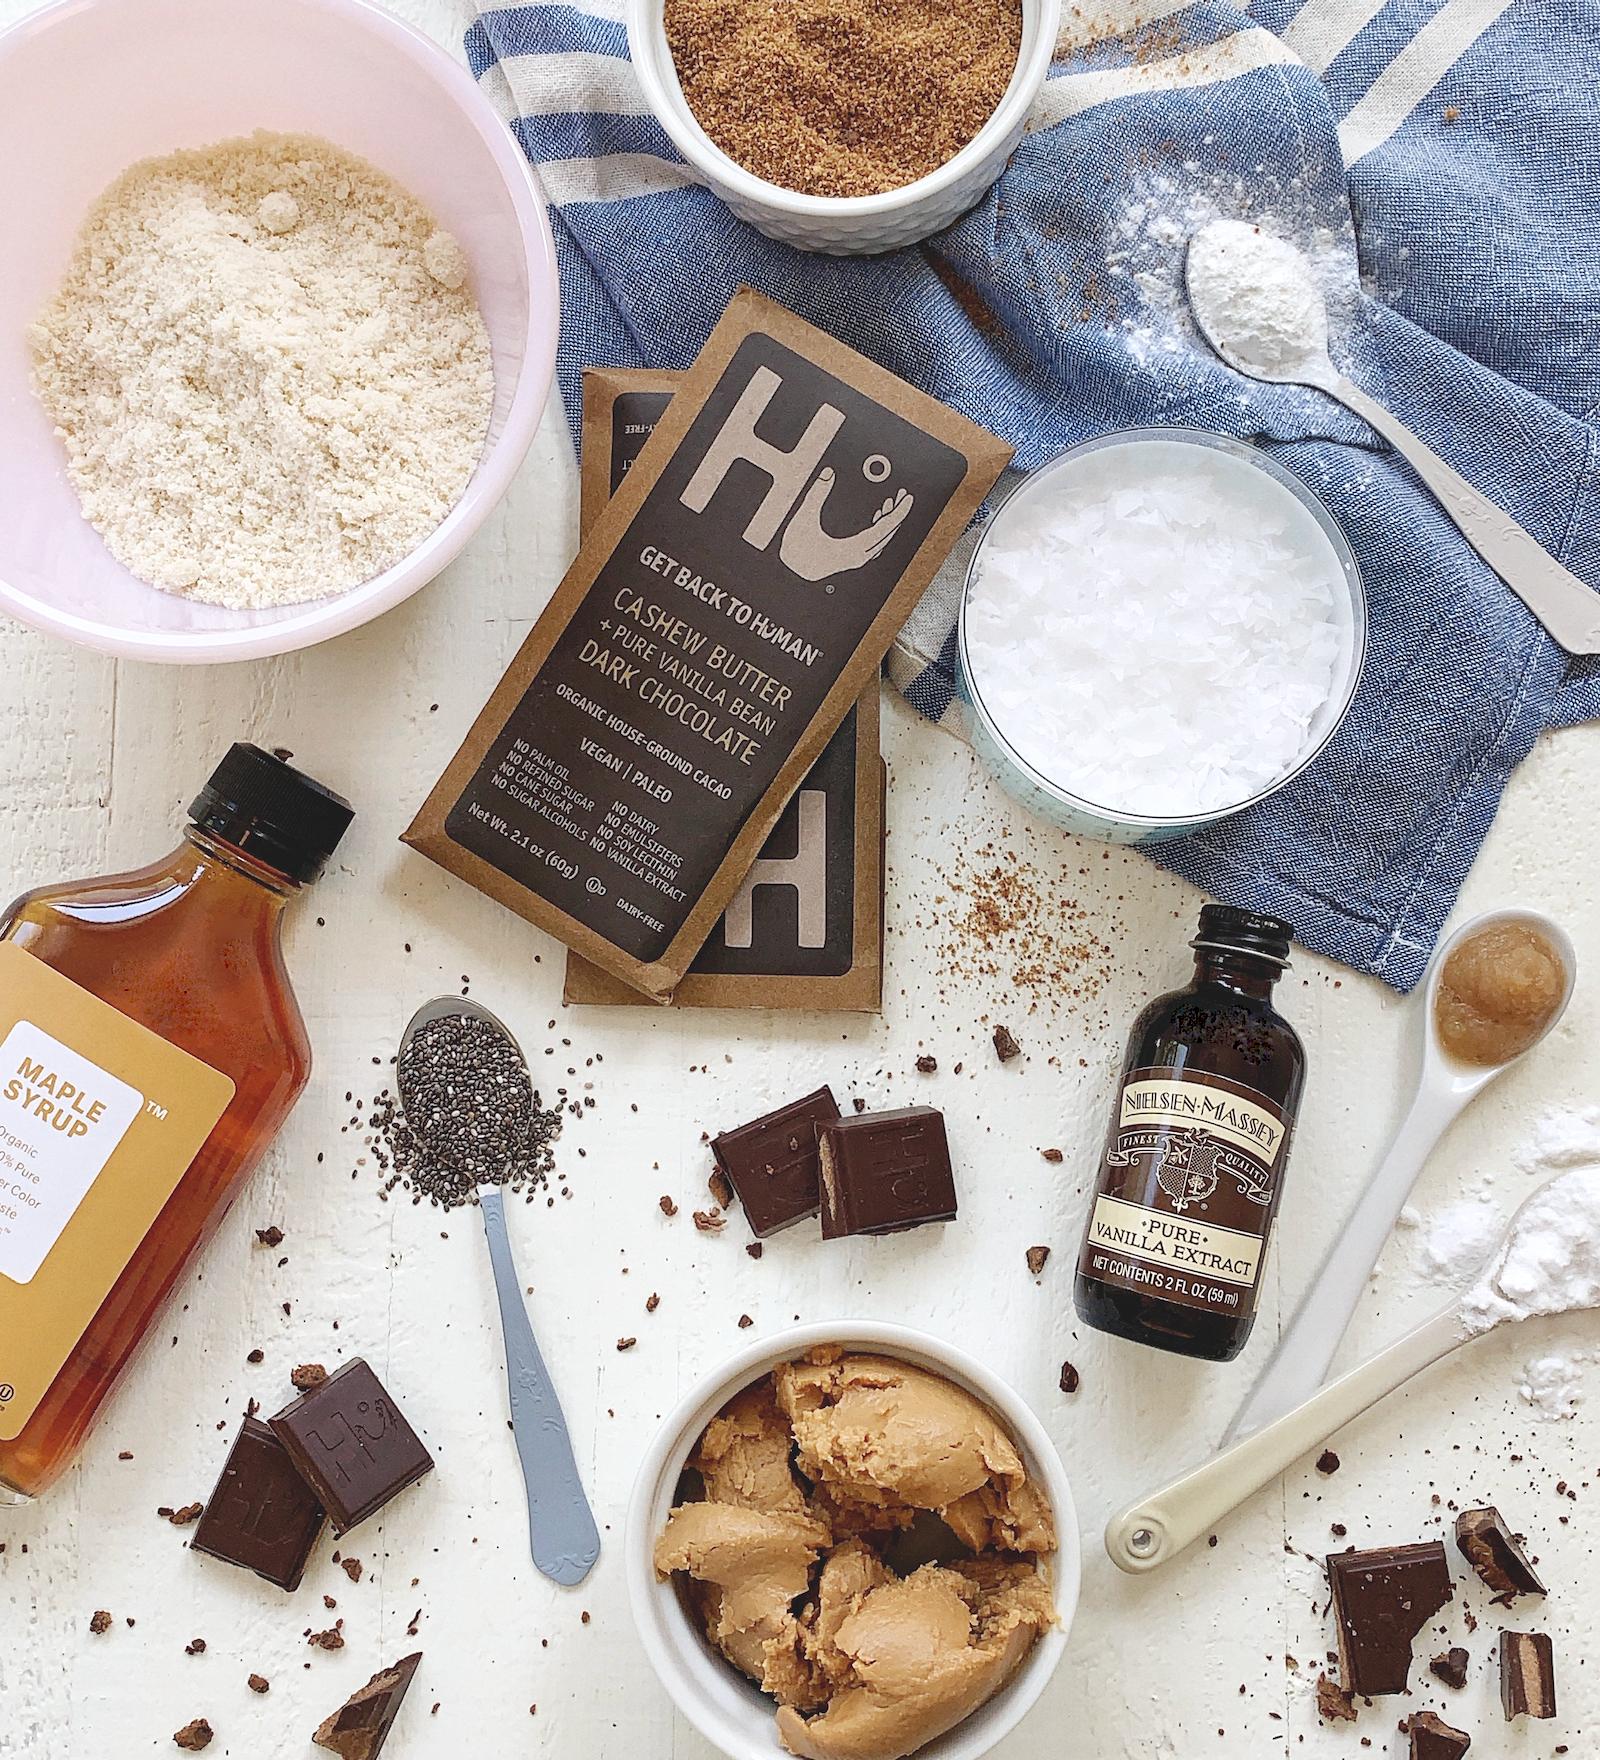 Arielle Lorre Chocolate Butter Cookie Recipe